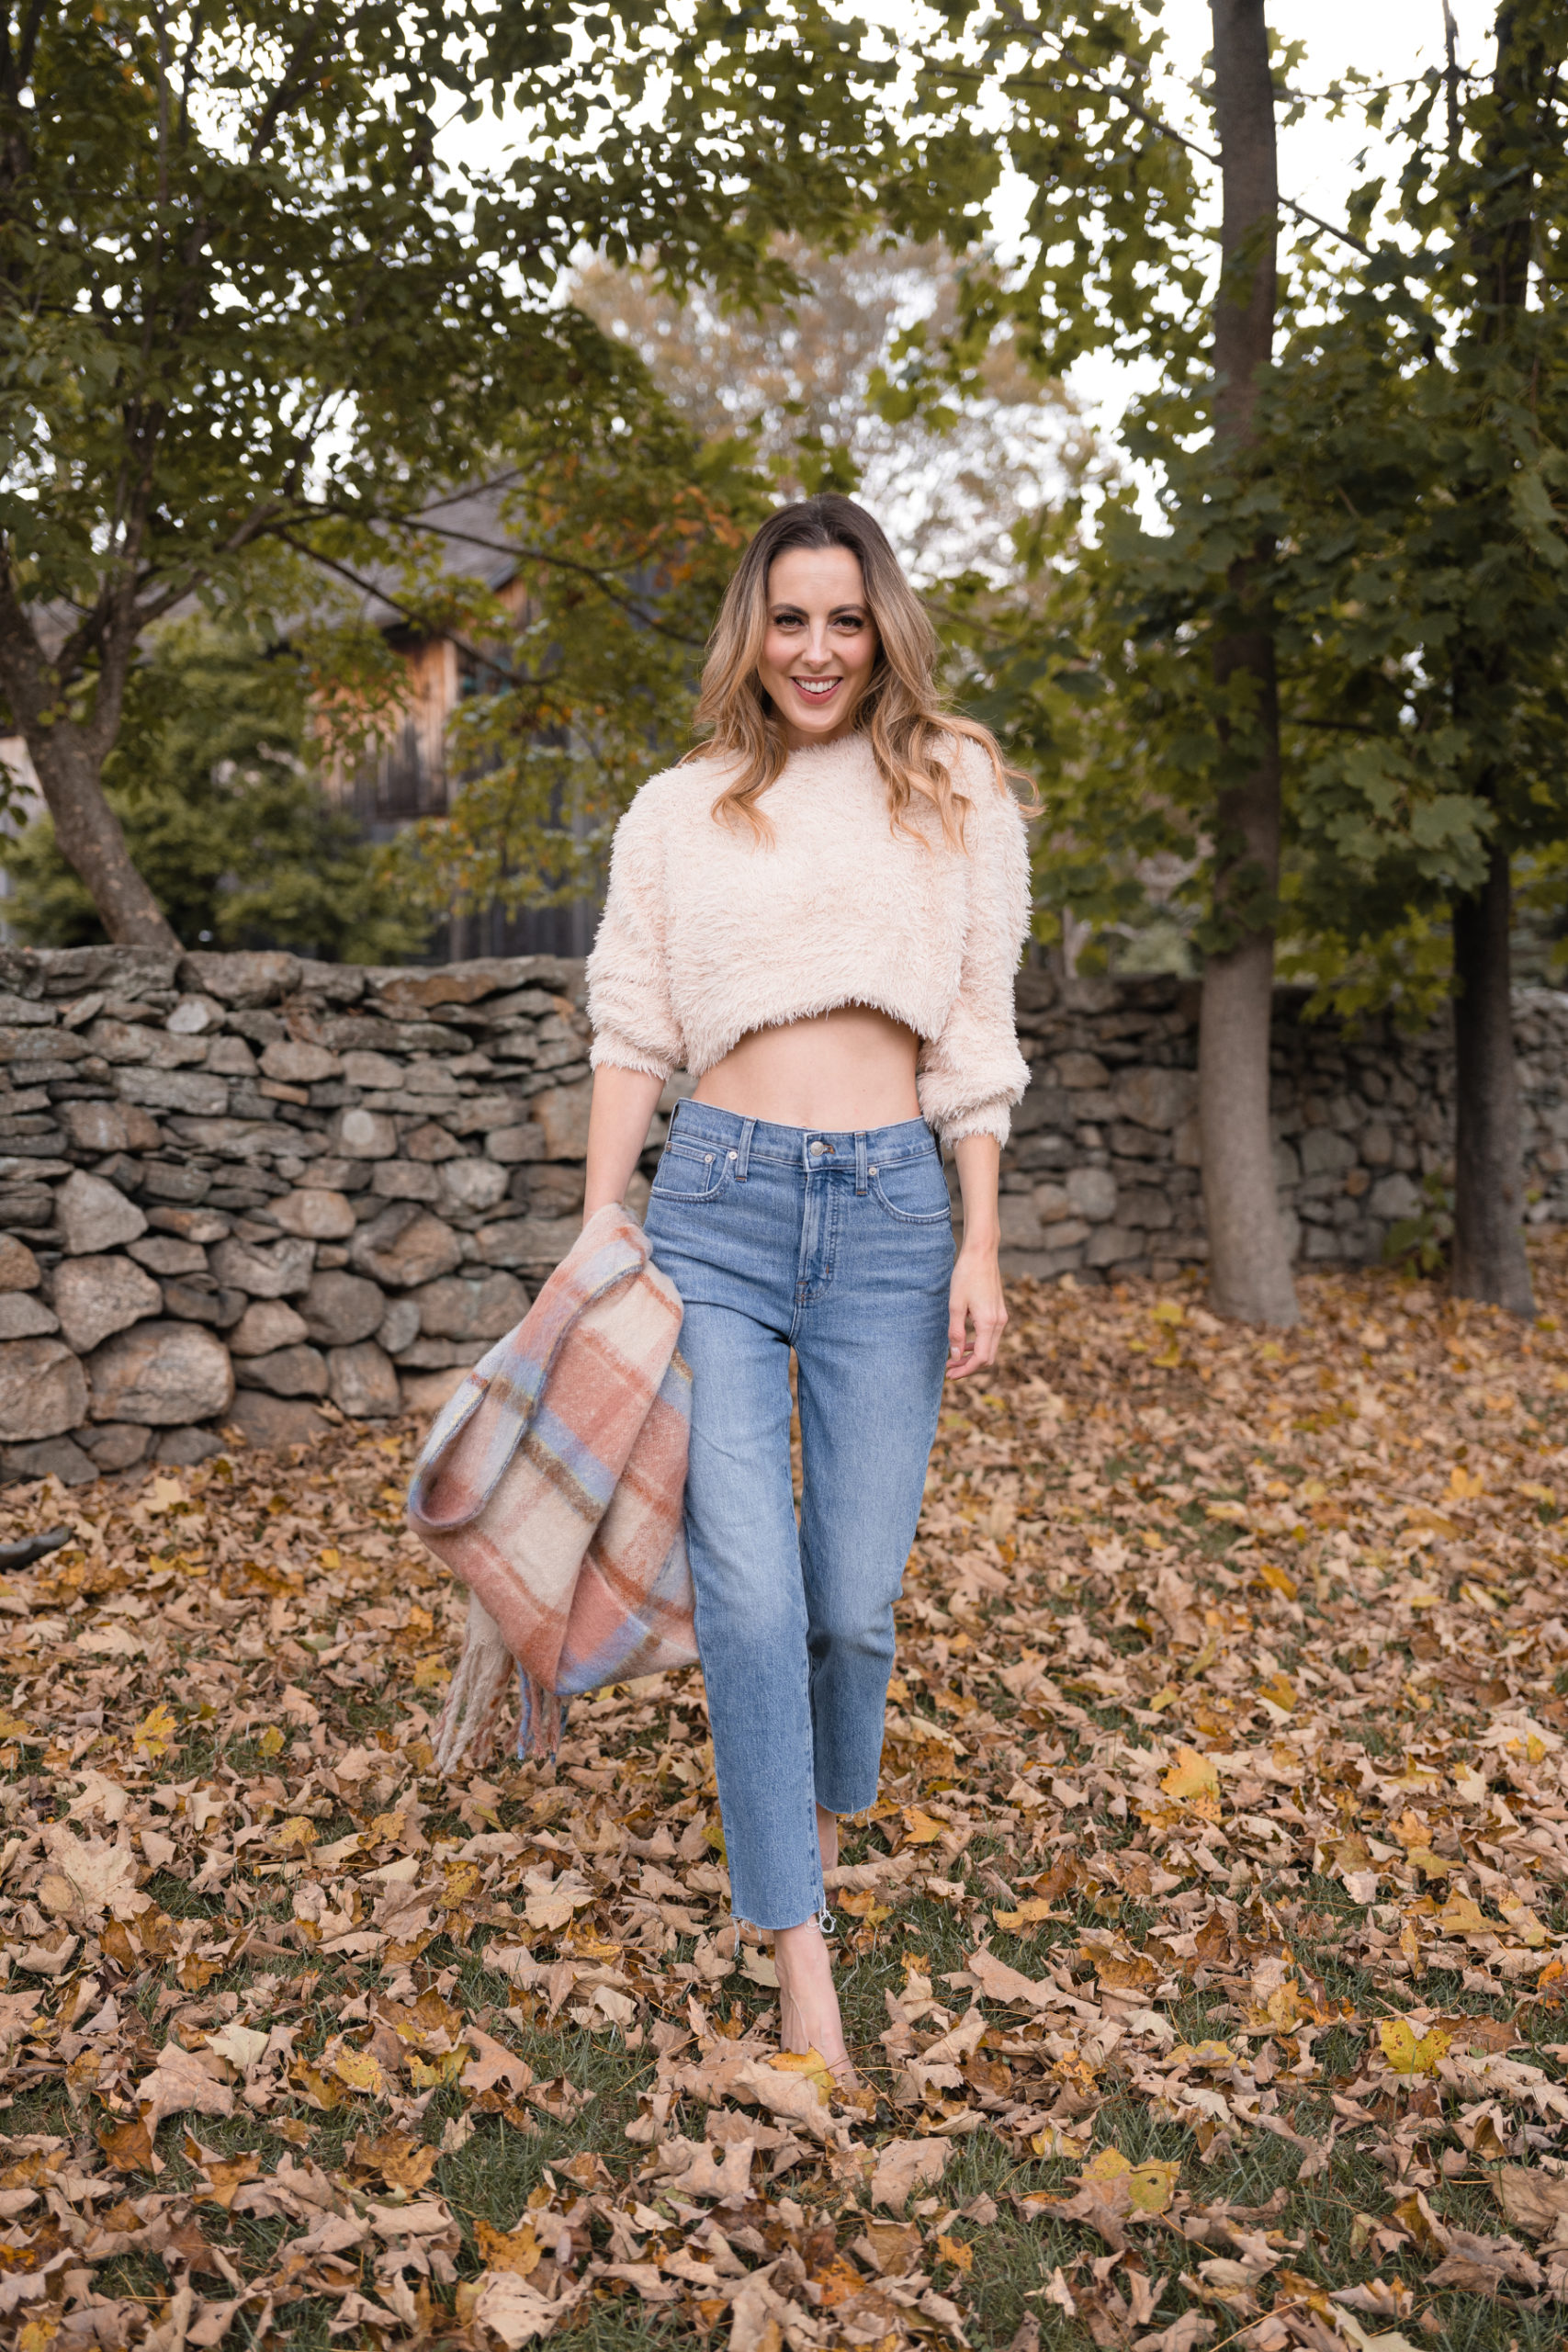 Eva Amurri shares her favorite cozy items to keep you snuggly all winter